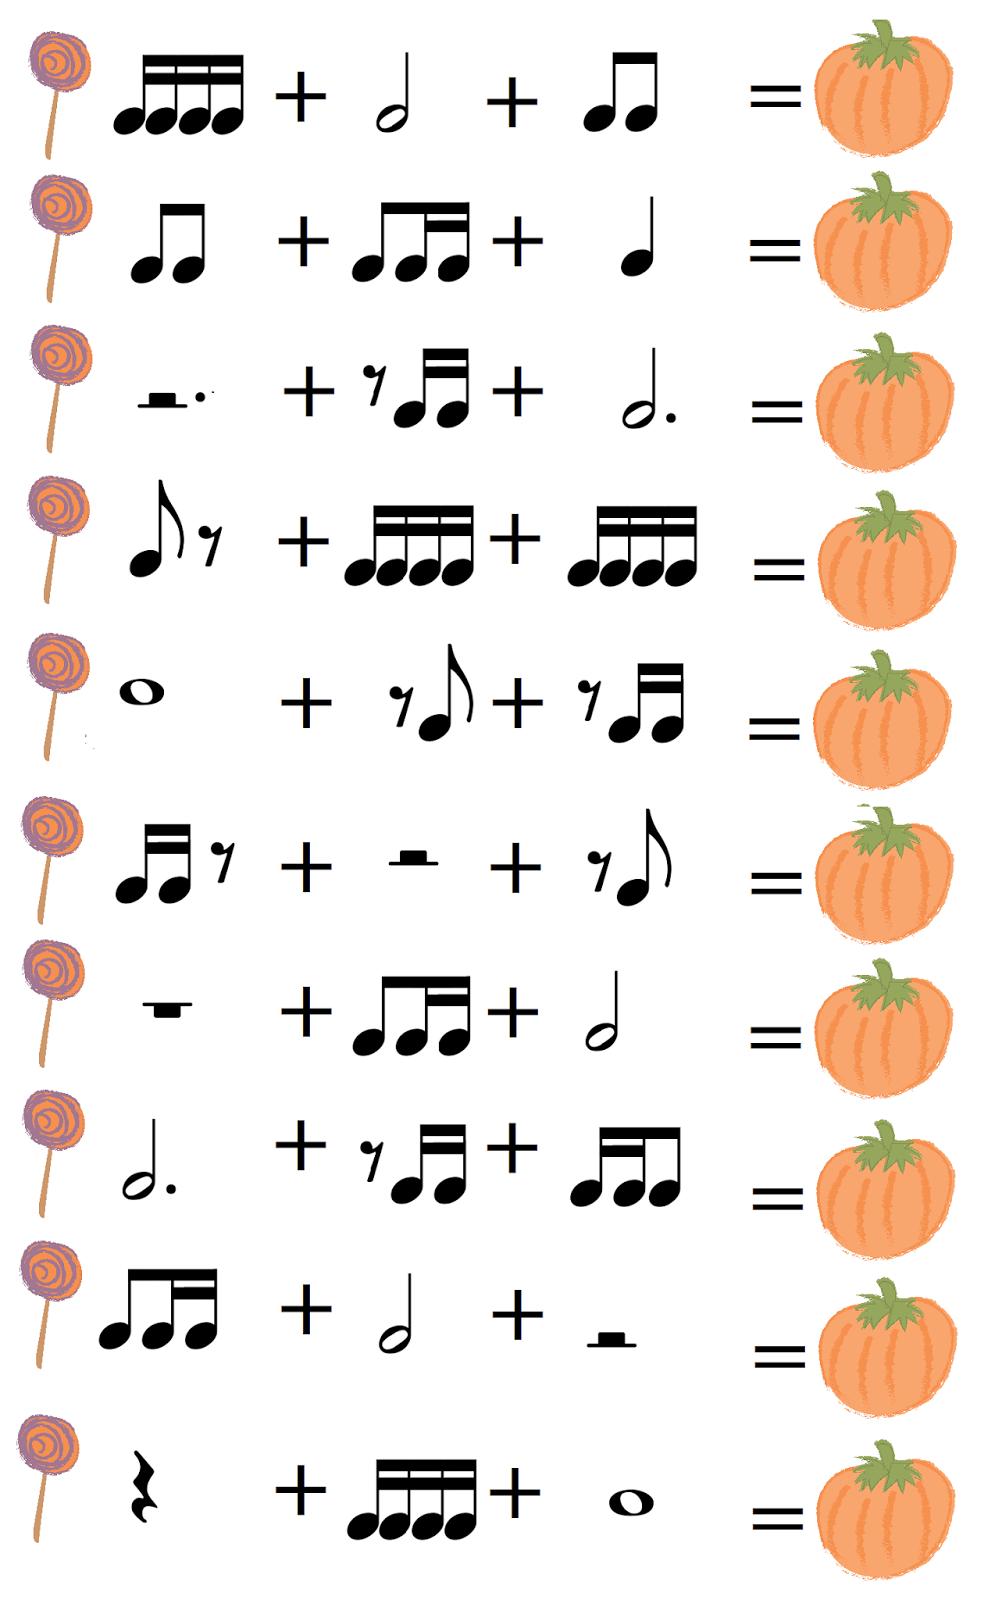 Ejercicio de lenguaje musical Concepto didcticovalores de las